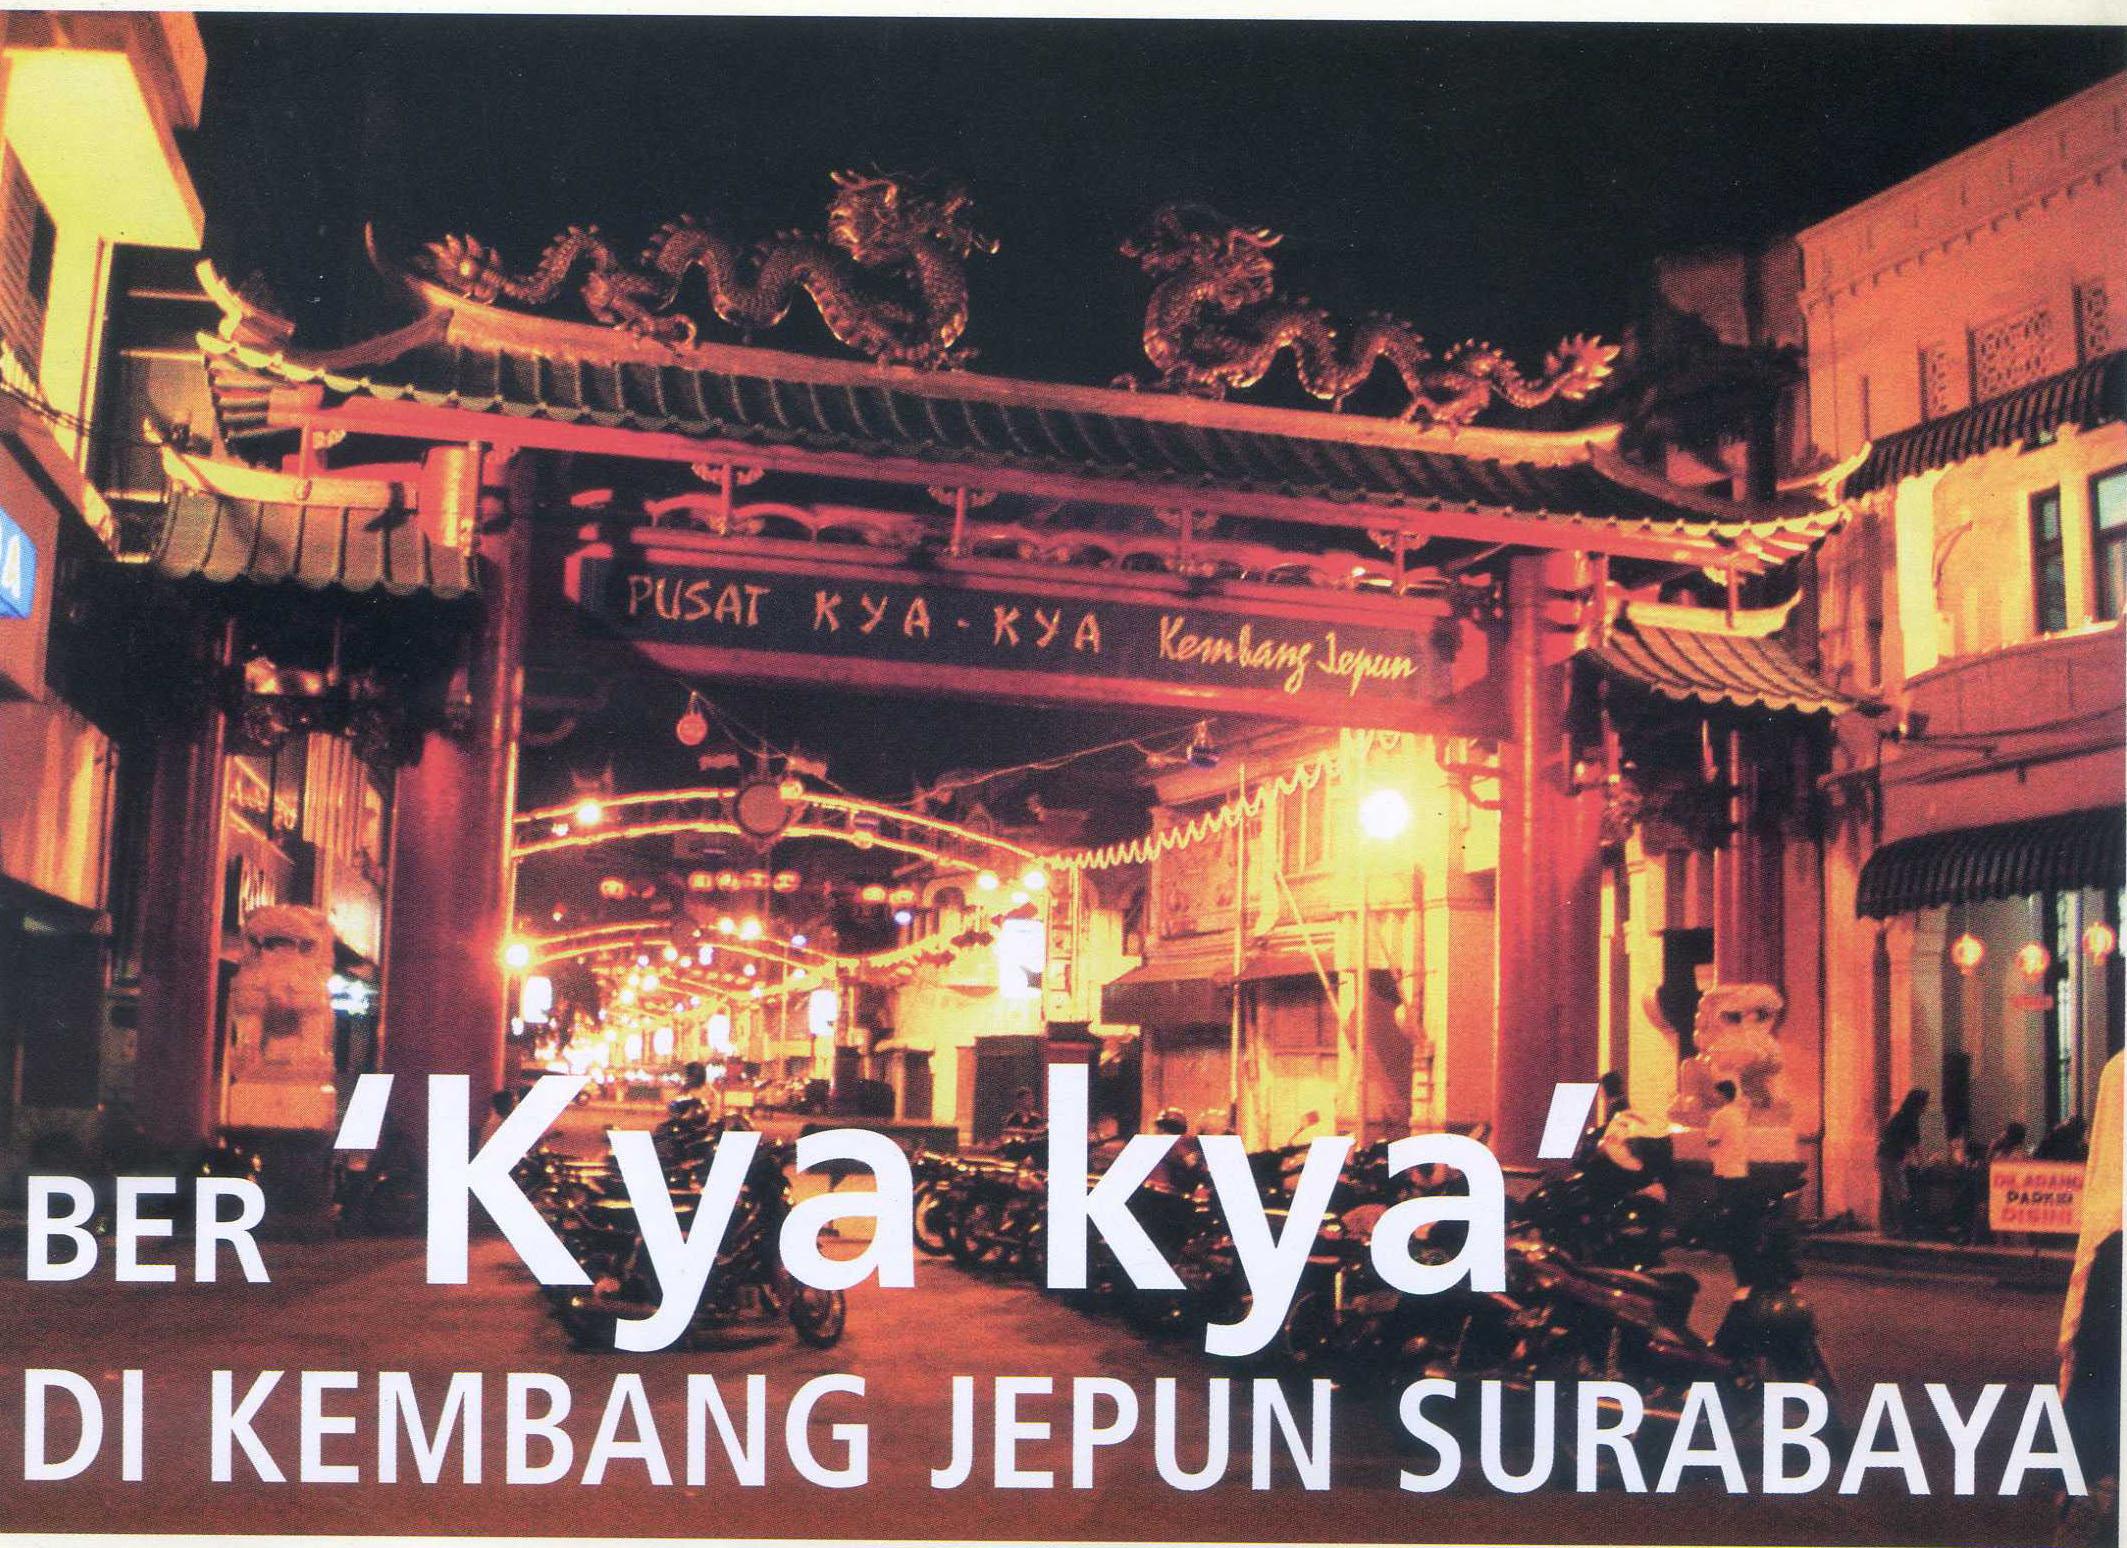 Ber Kya Kembang Jepun Surabaya Pusaka Jawatimuran Kembangjepun Terletak Sepanjang